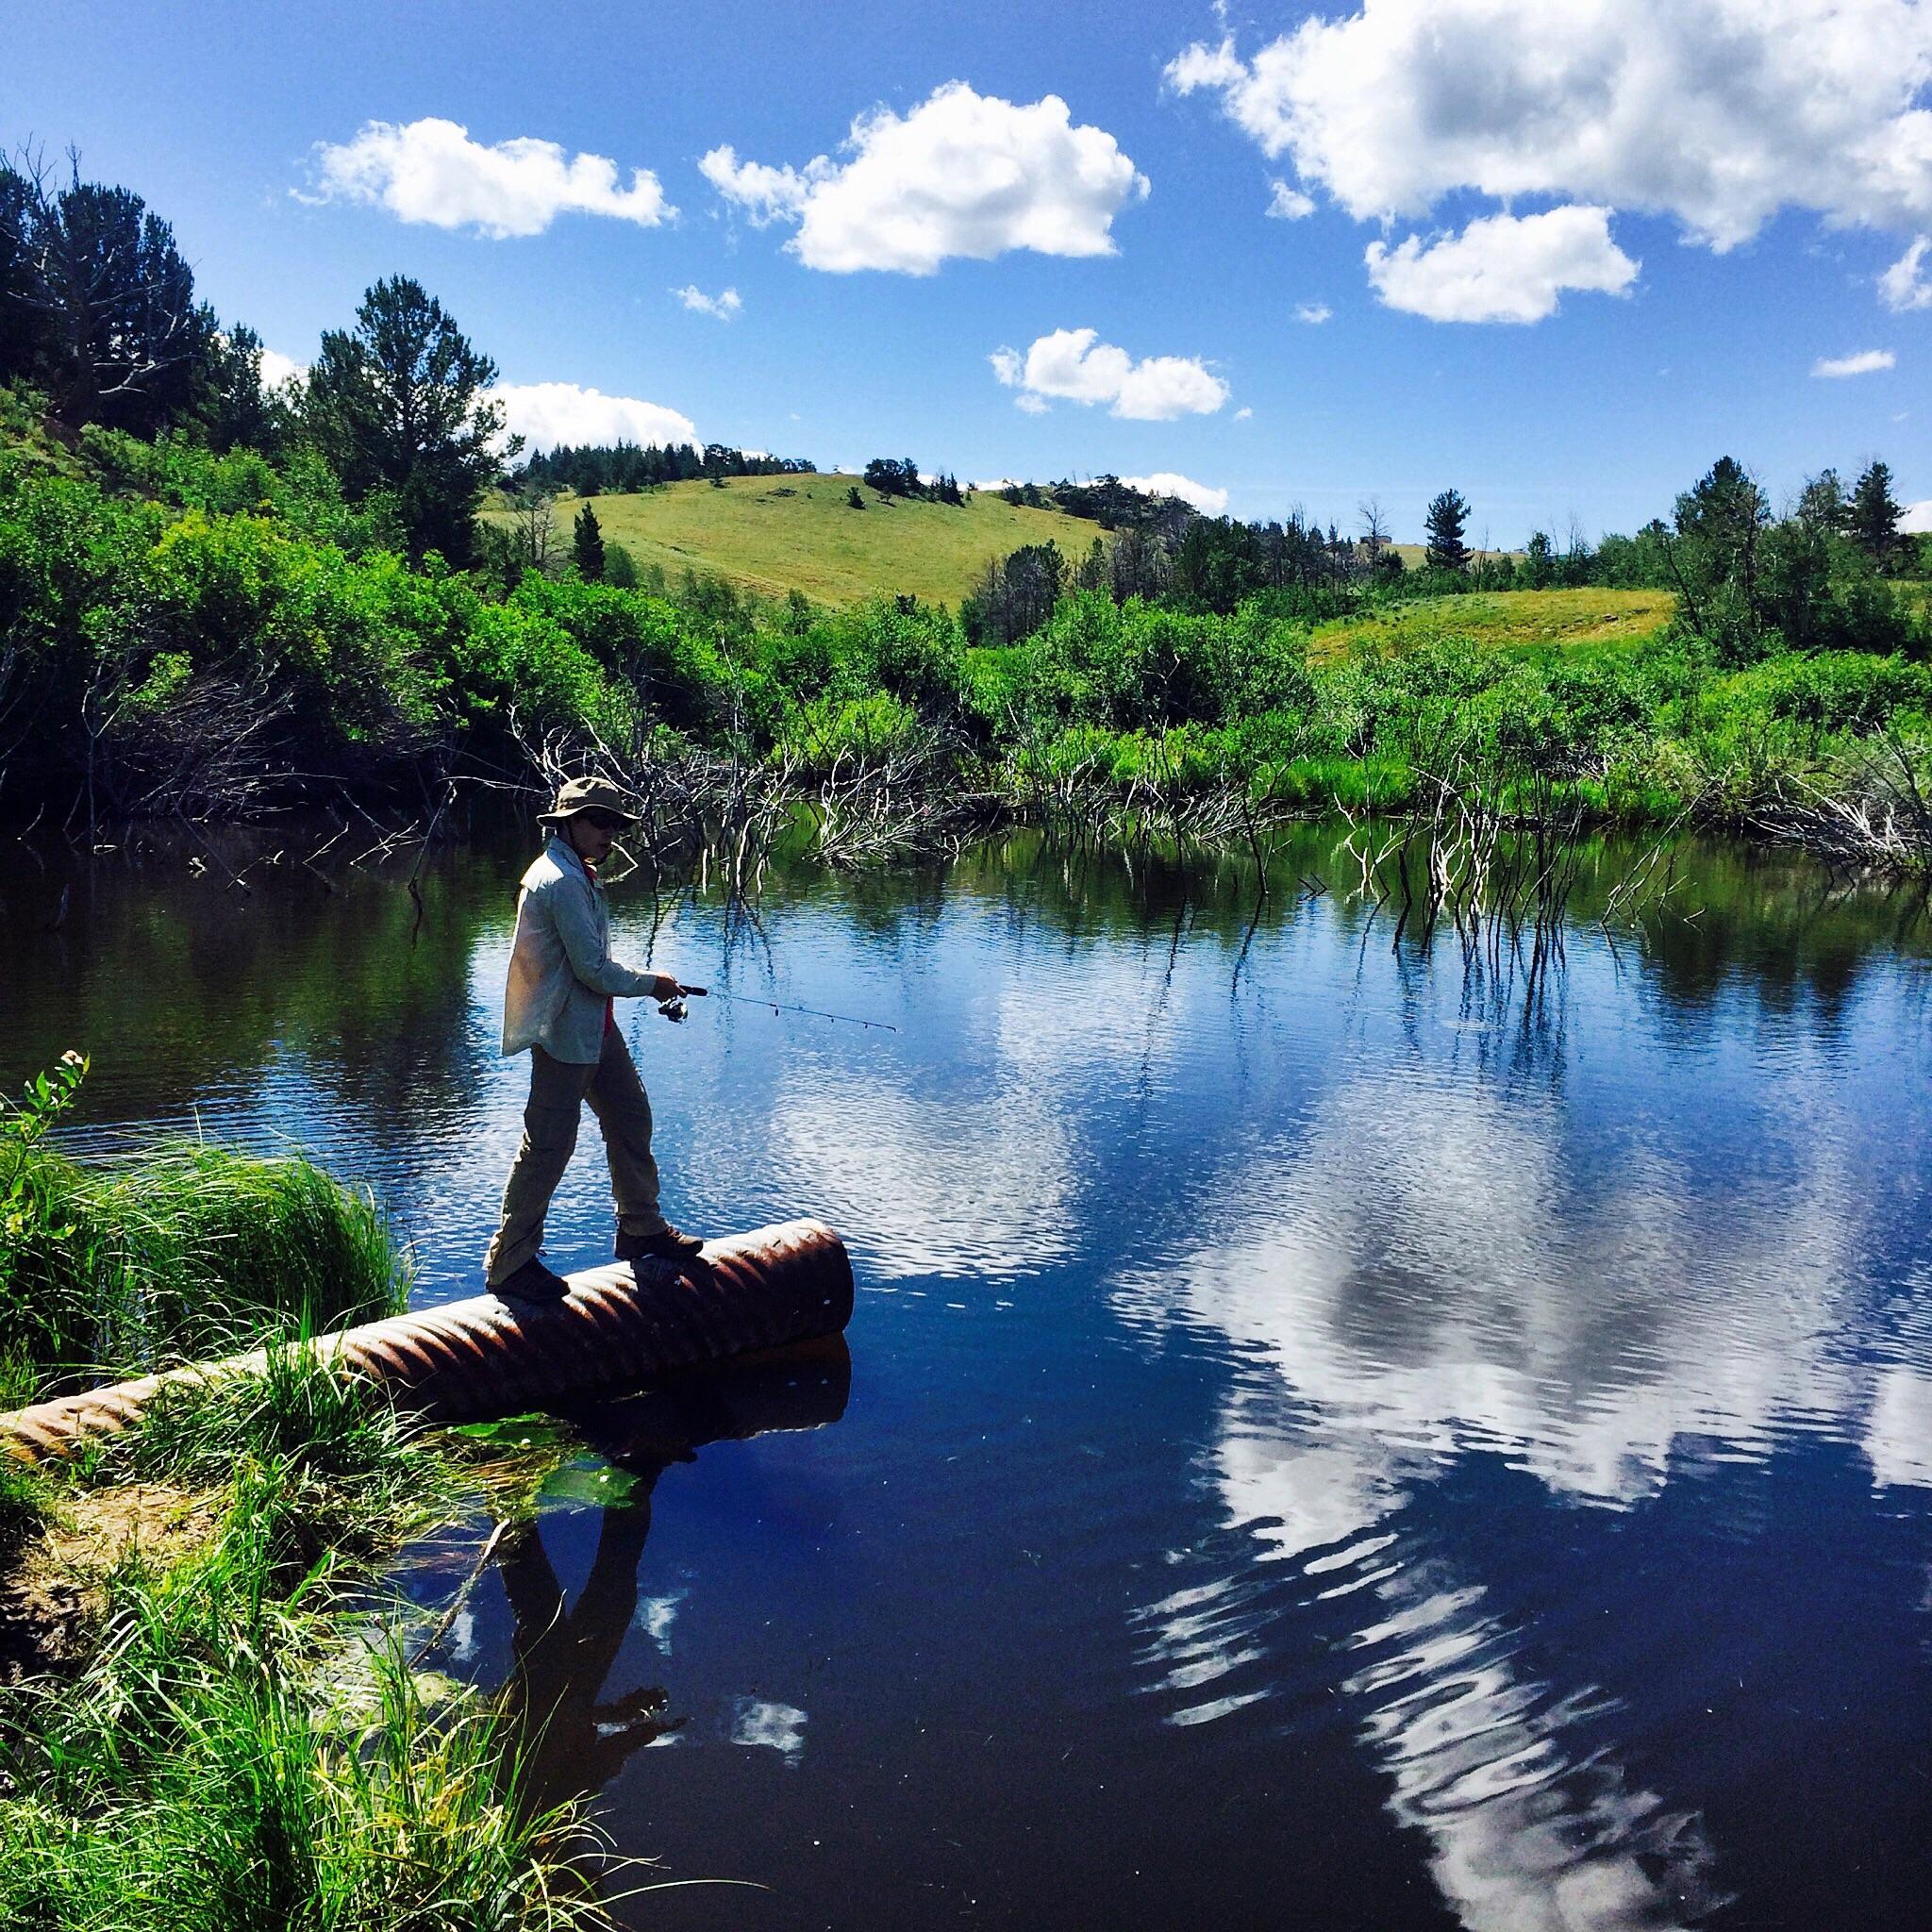 Gabe at Bennet's Pond